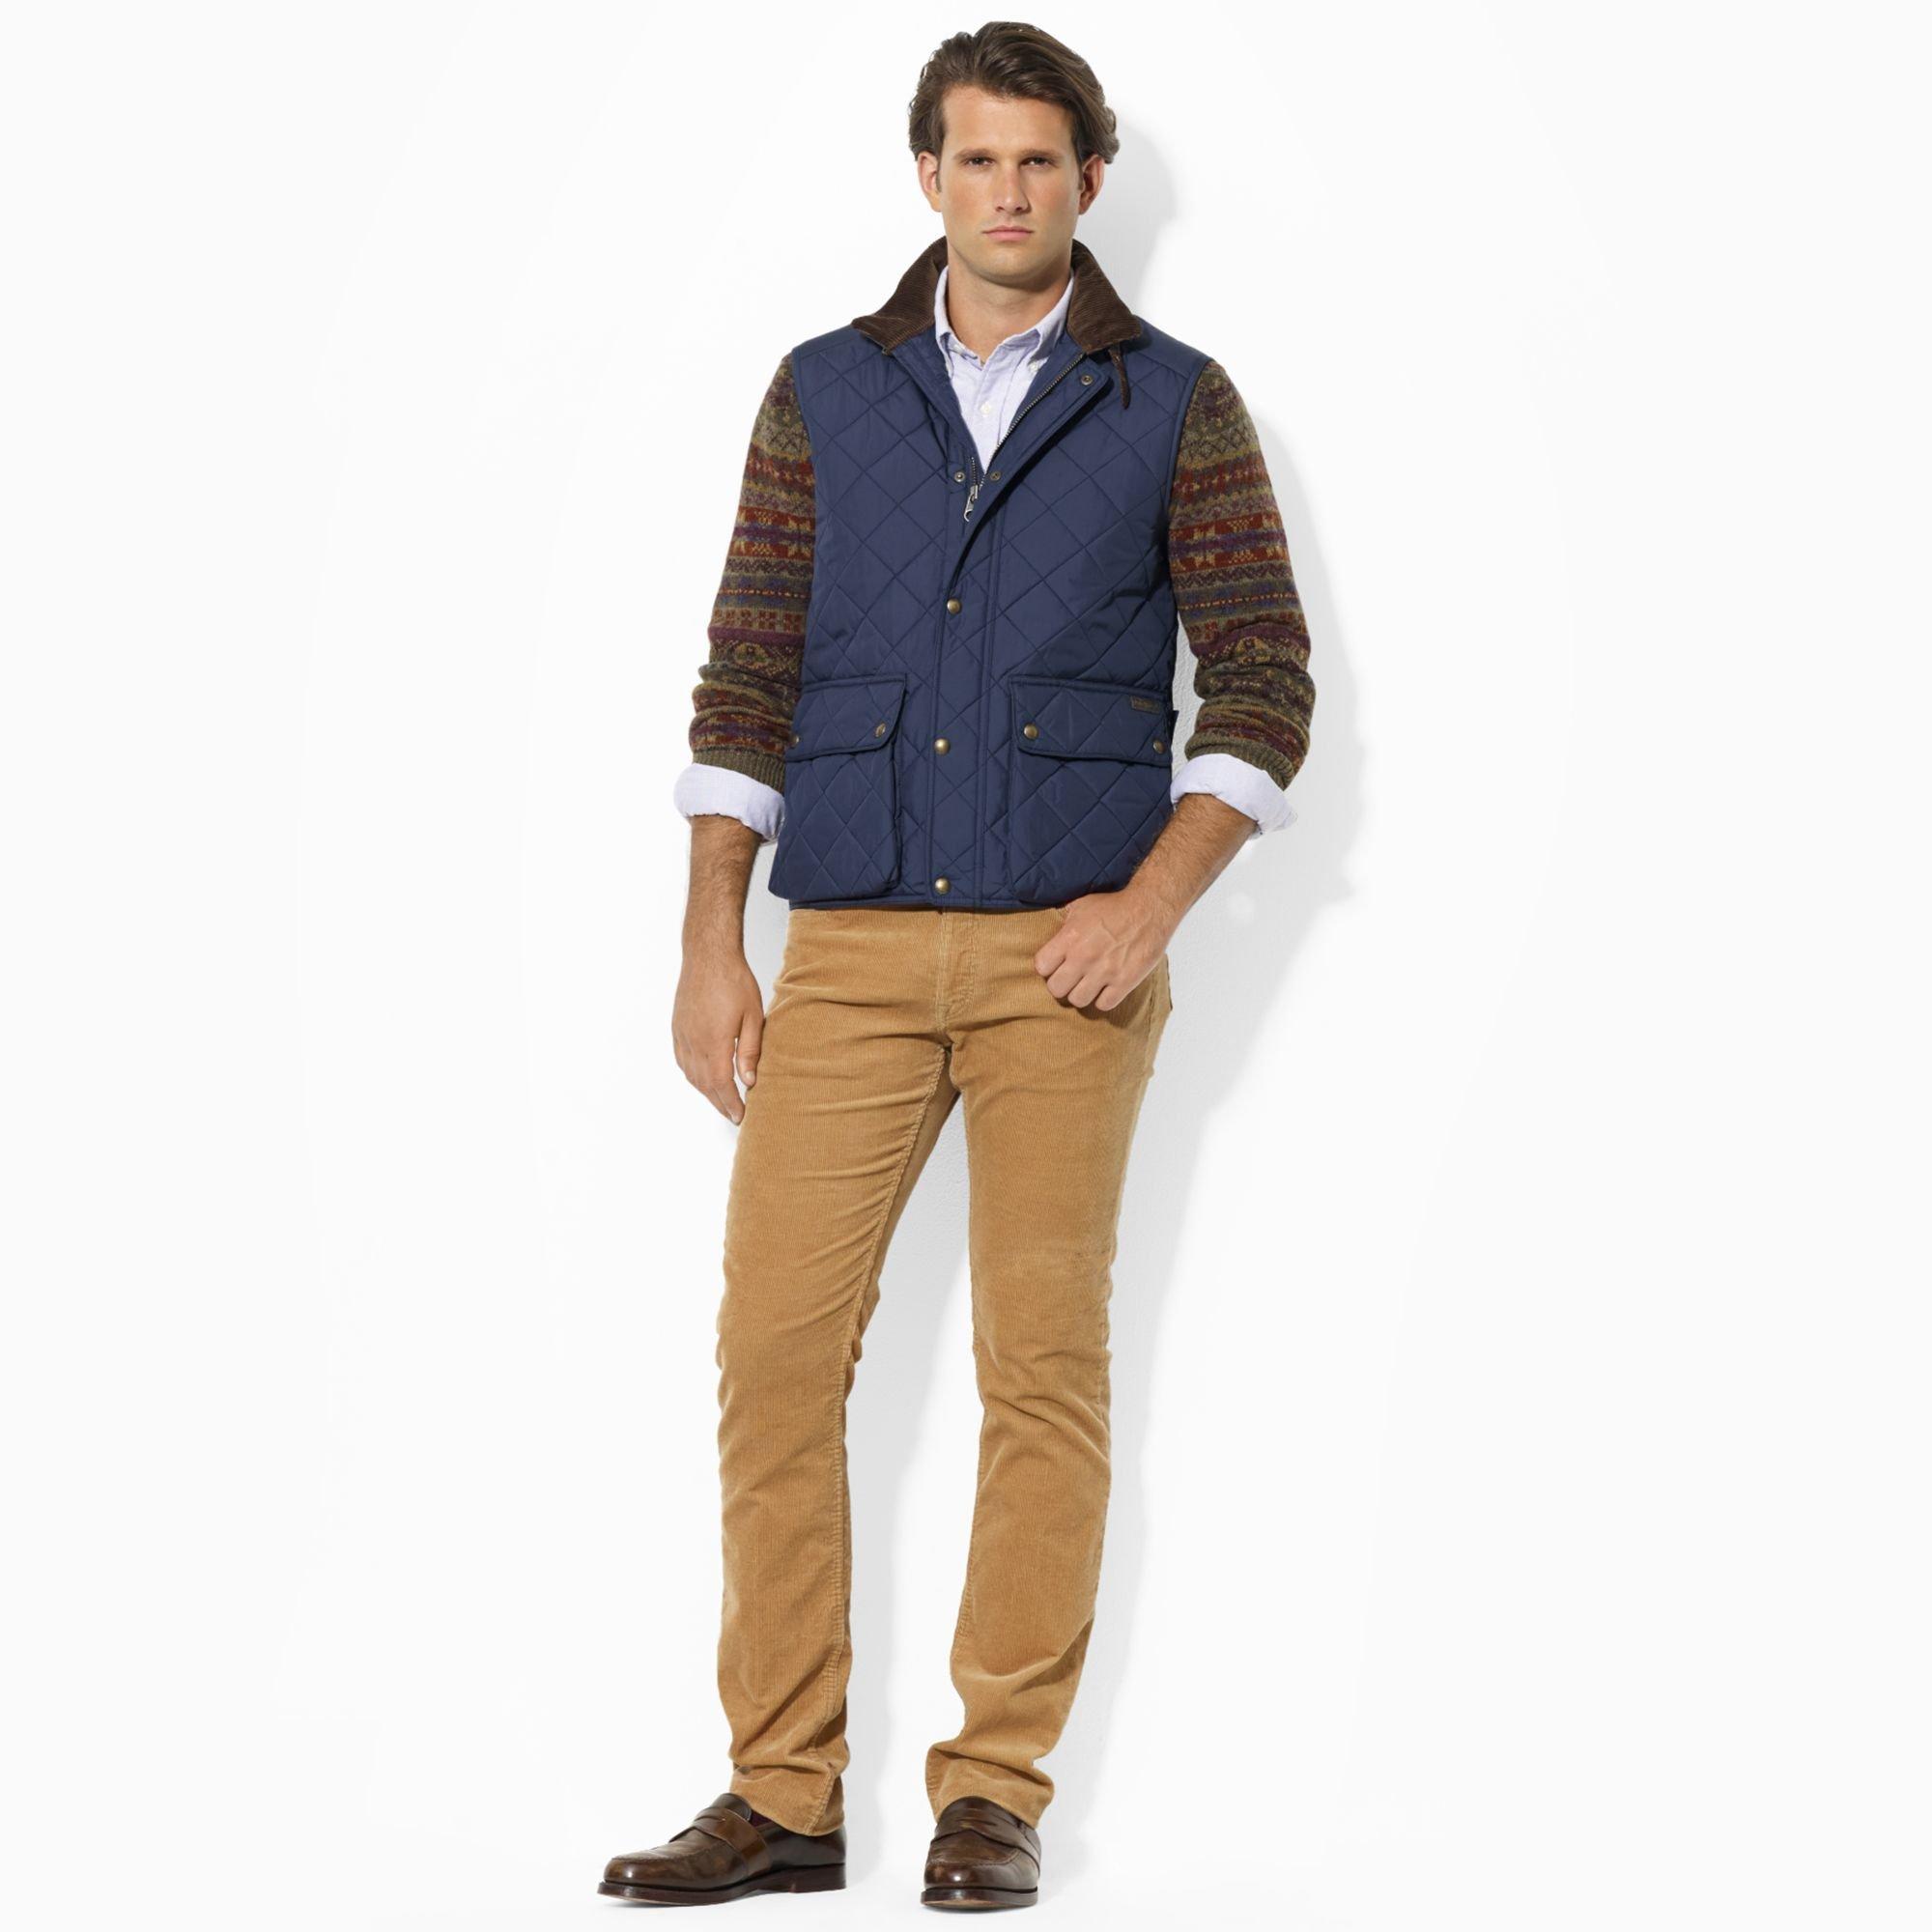 Polo Blue Epson Men Lauren Quilted Ralph Vest For bfgY7I6yvm